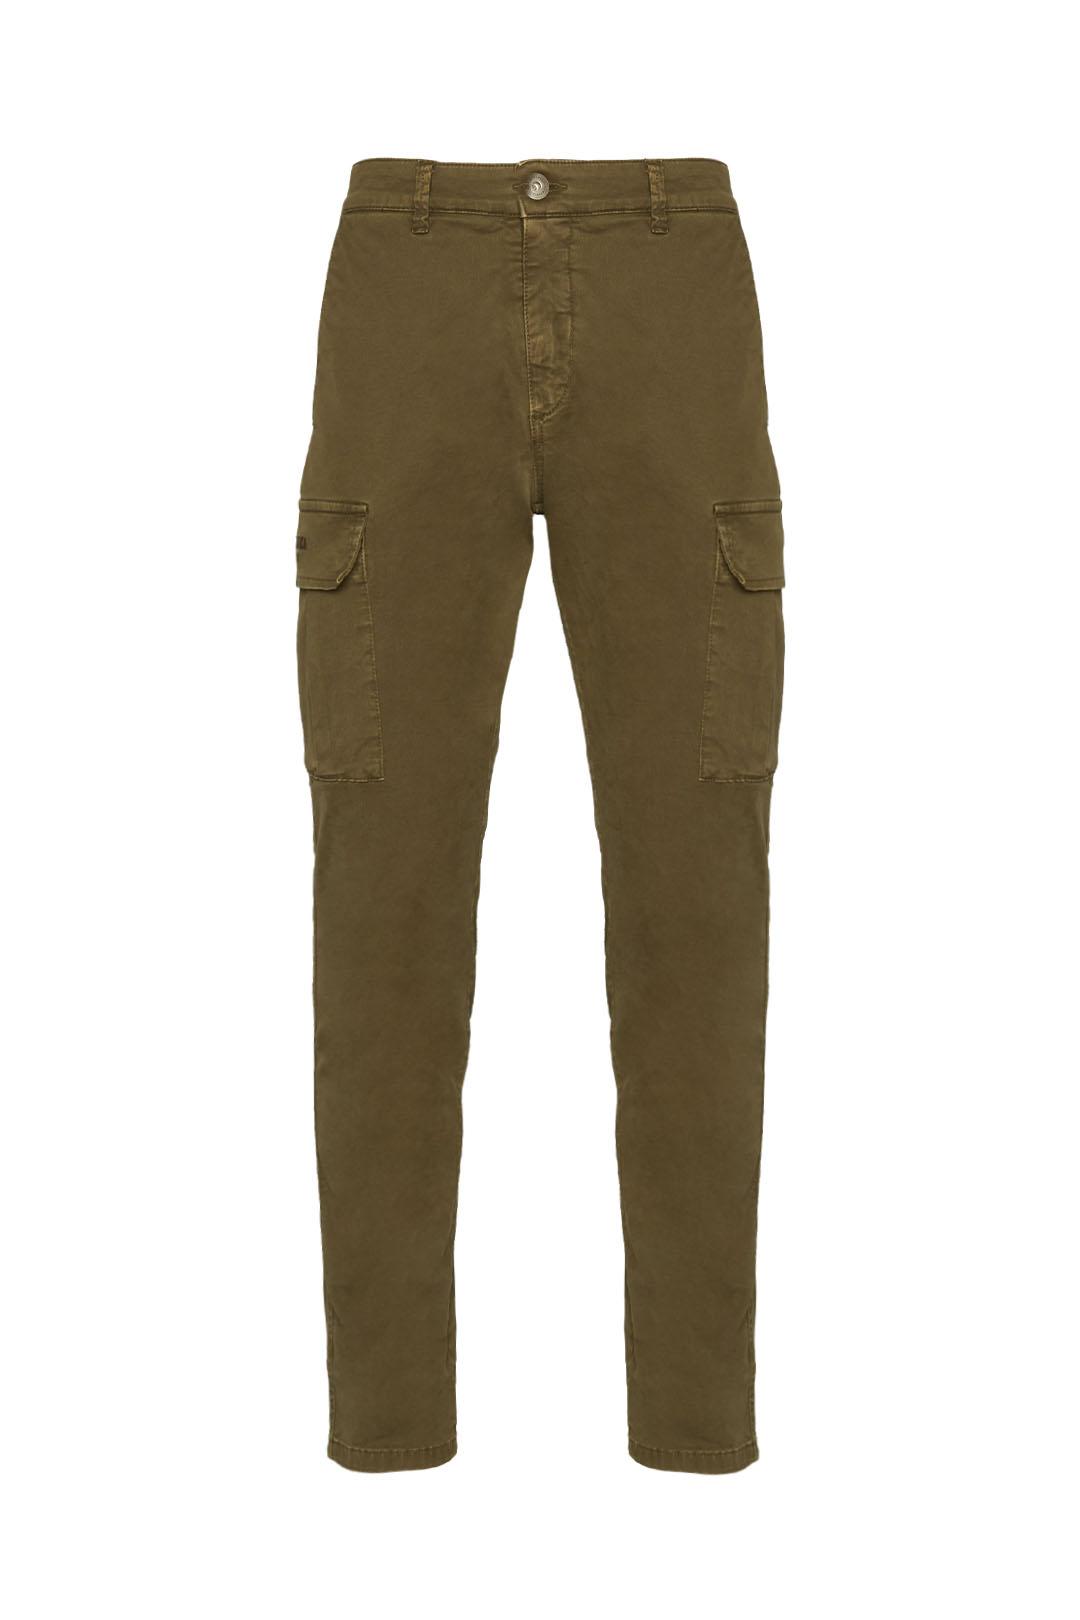 Pantalon multipoches en gabardine        1